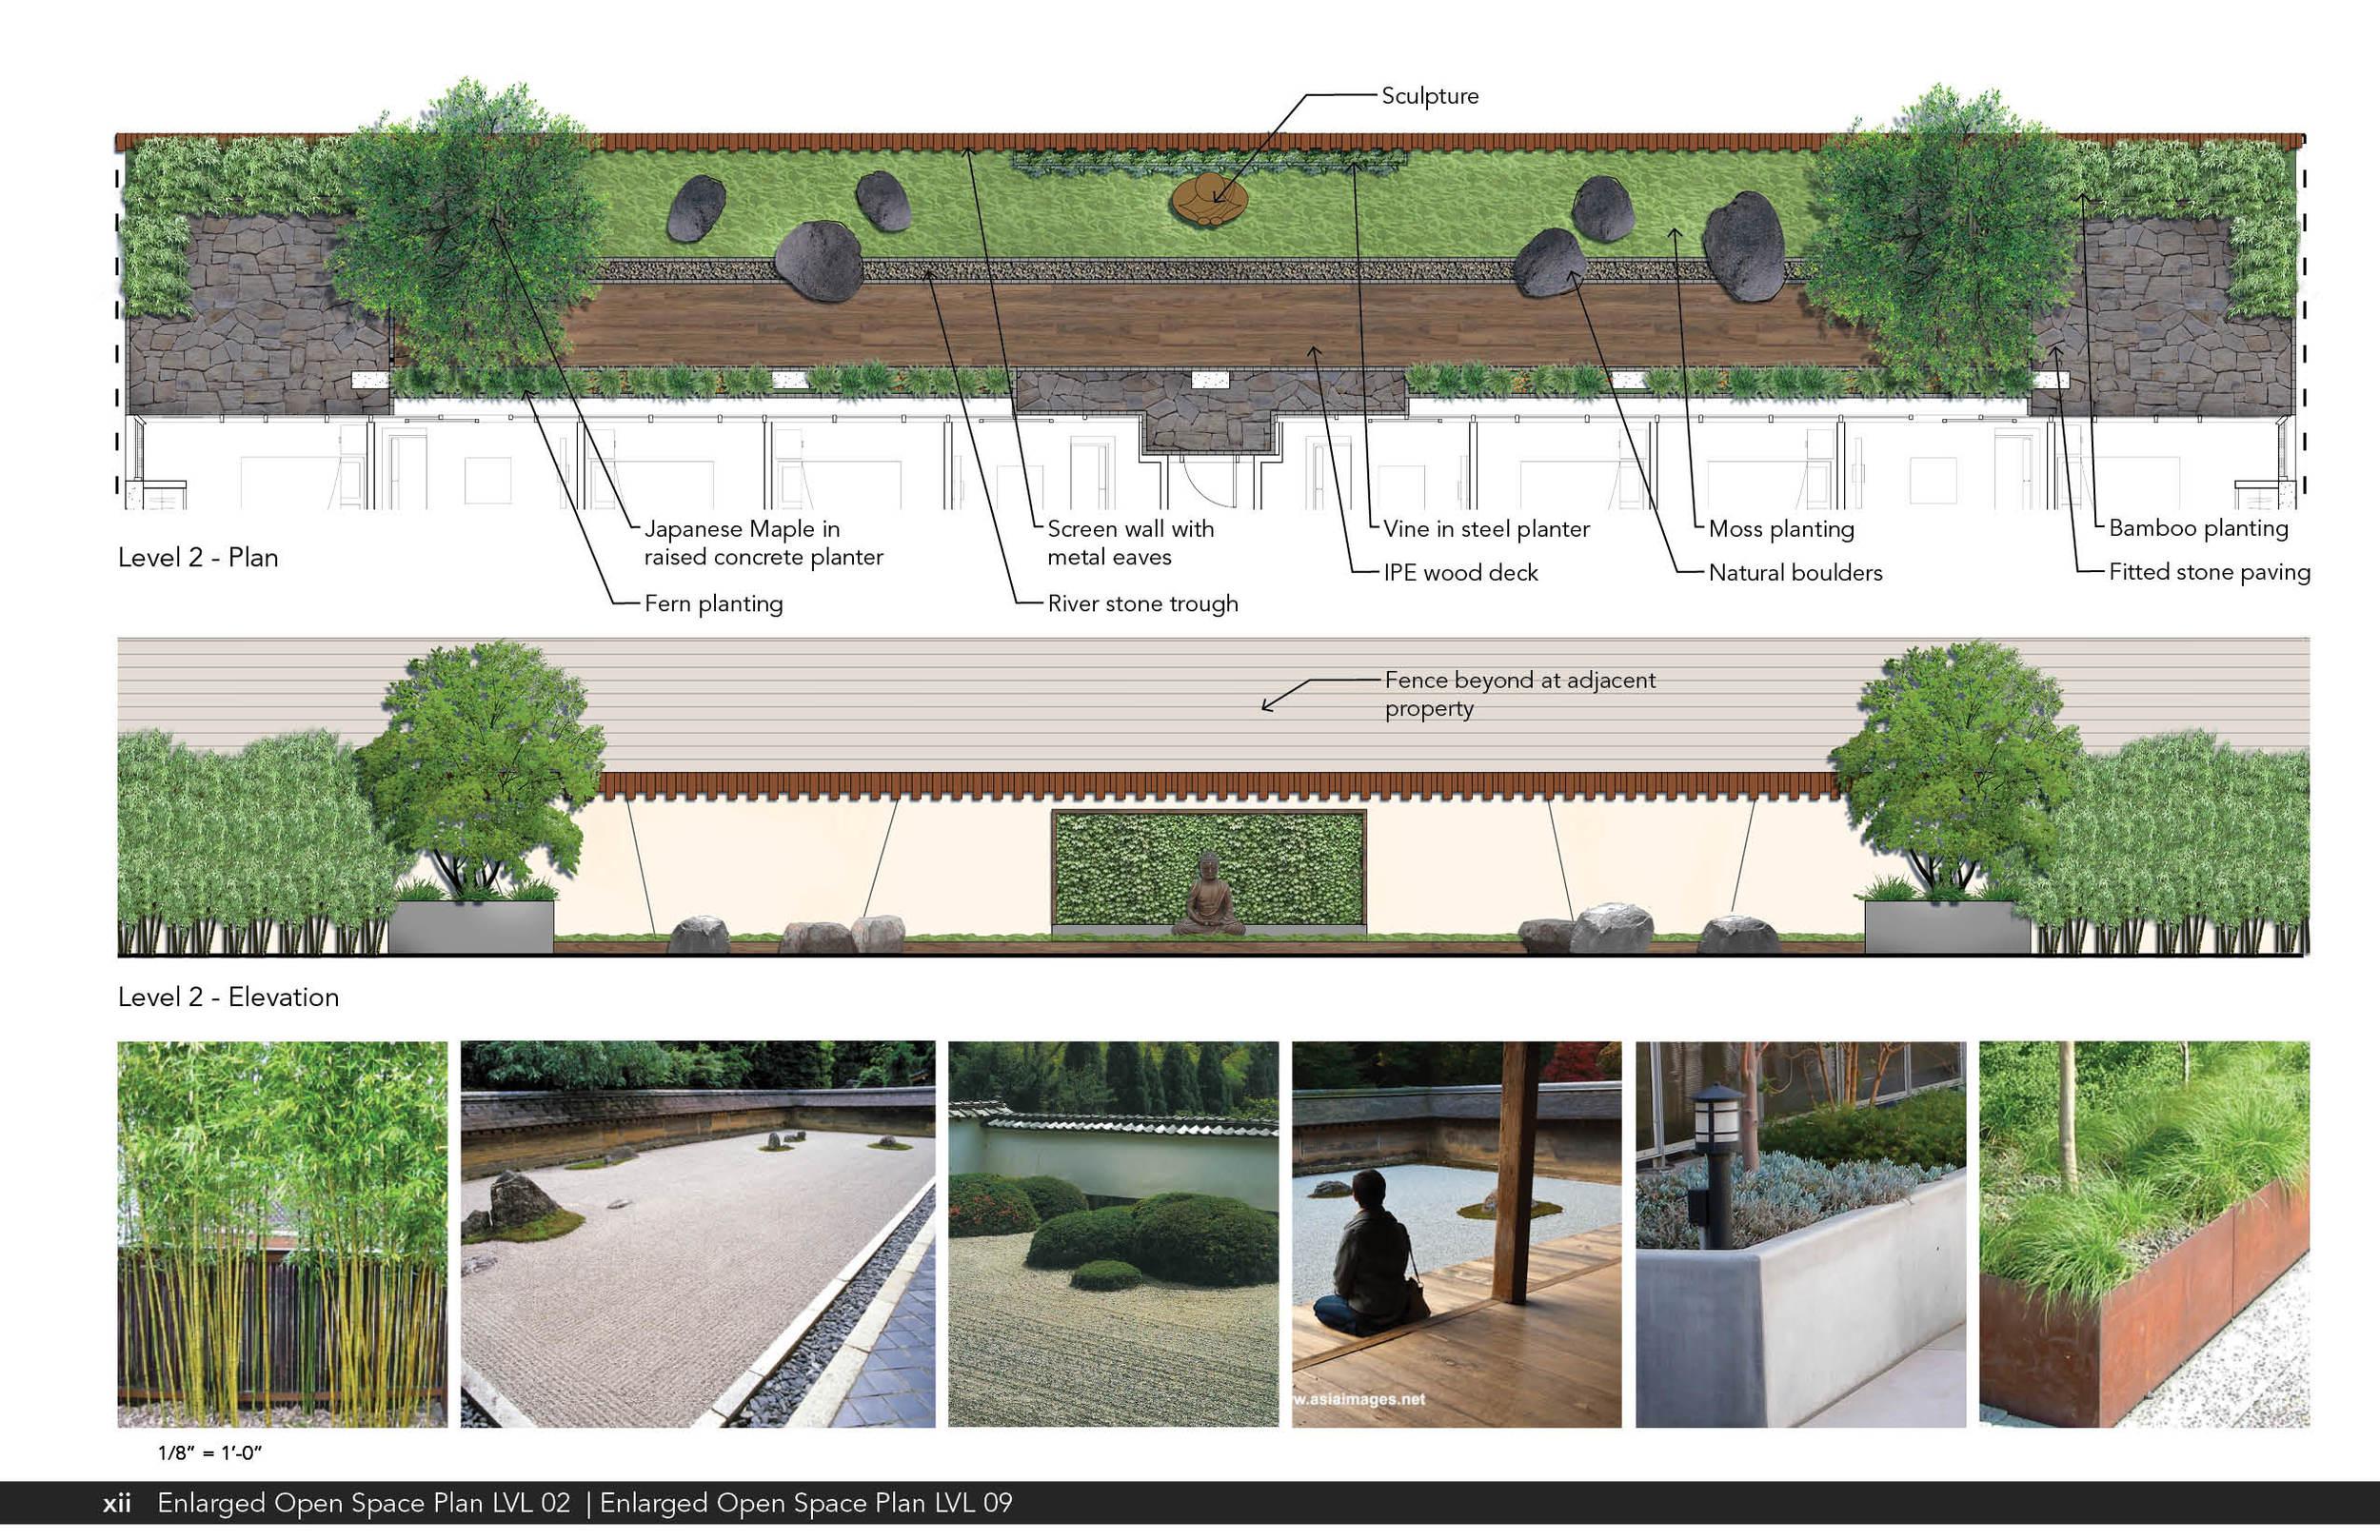 2014-07-01_Potrero-Planning Submission3.jpg